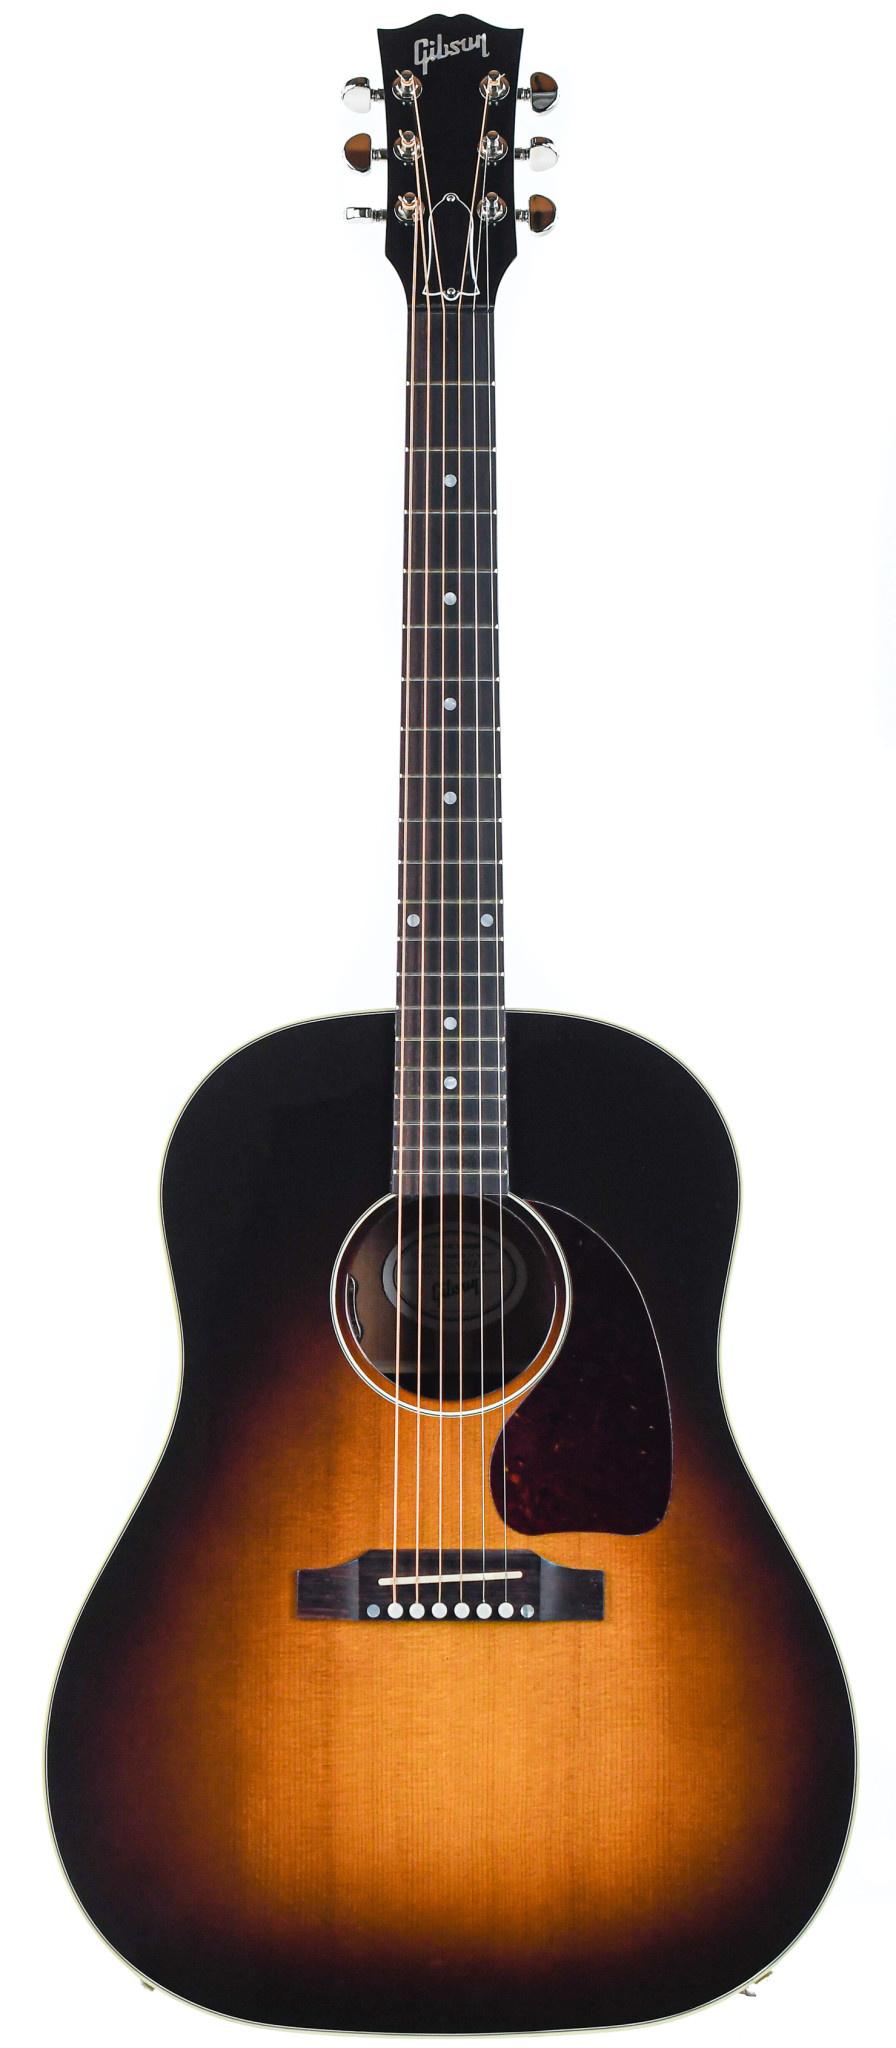 Gibson J45 Standard Vintage Sunburst B Stock